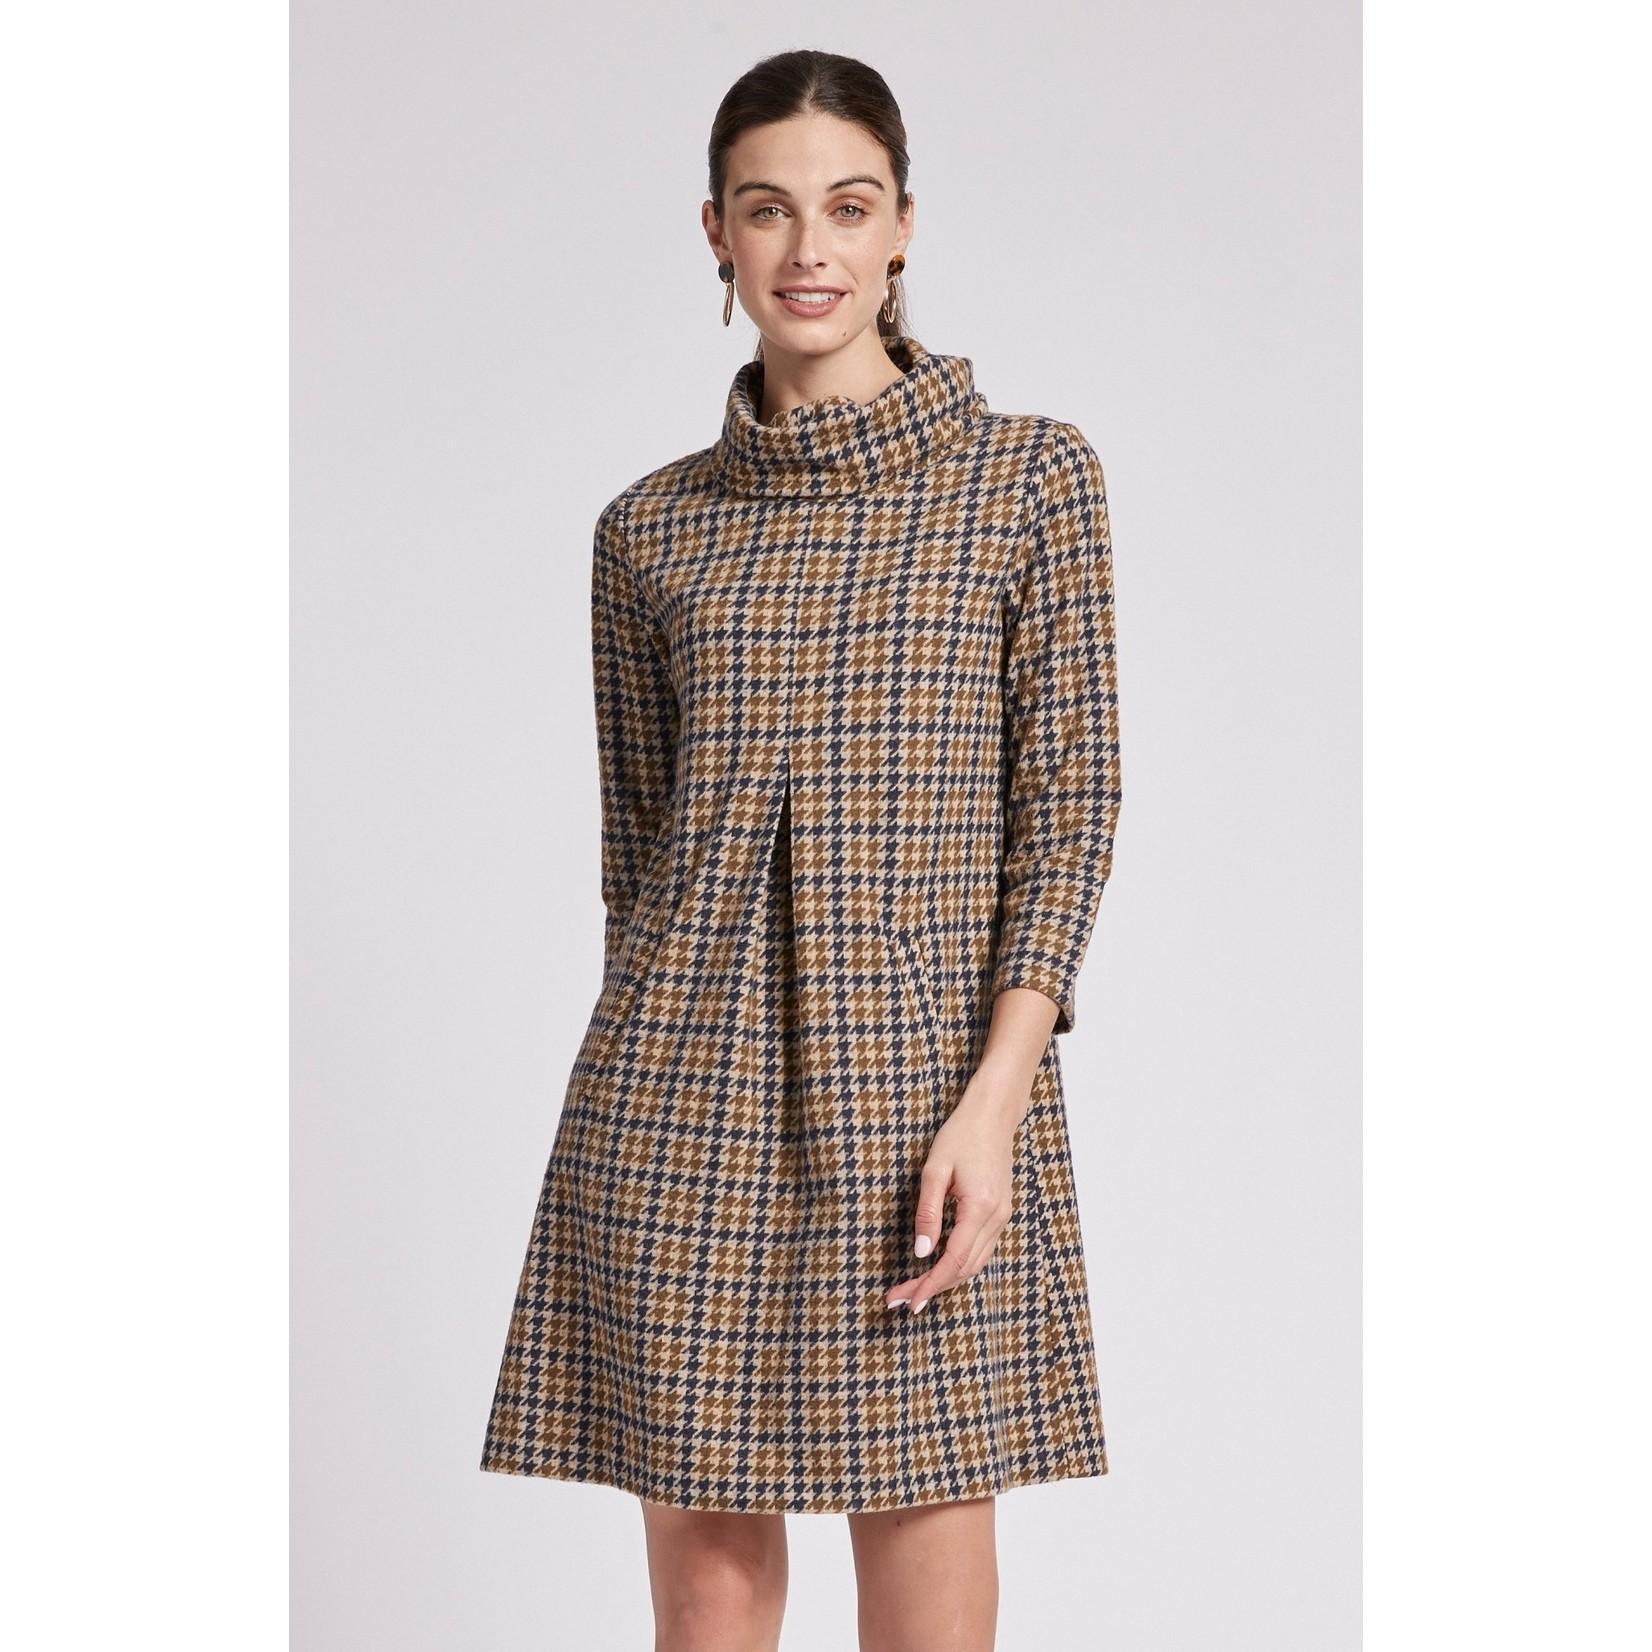 Tyler Boe Kim Jacquard Knit Dress in Houndstooth